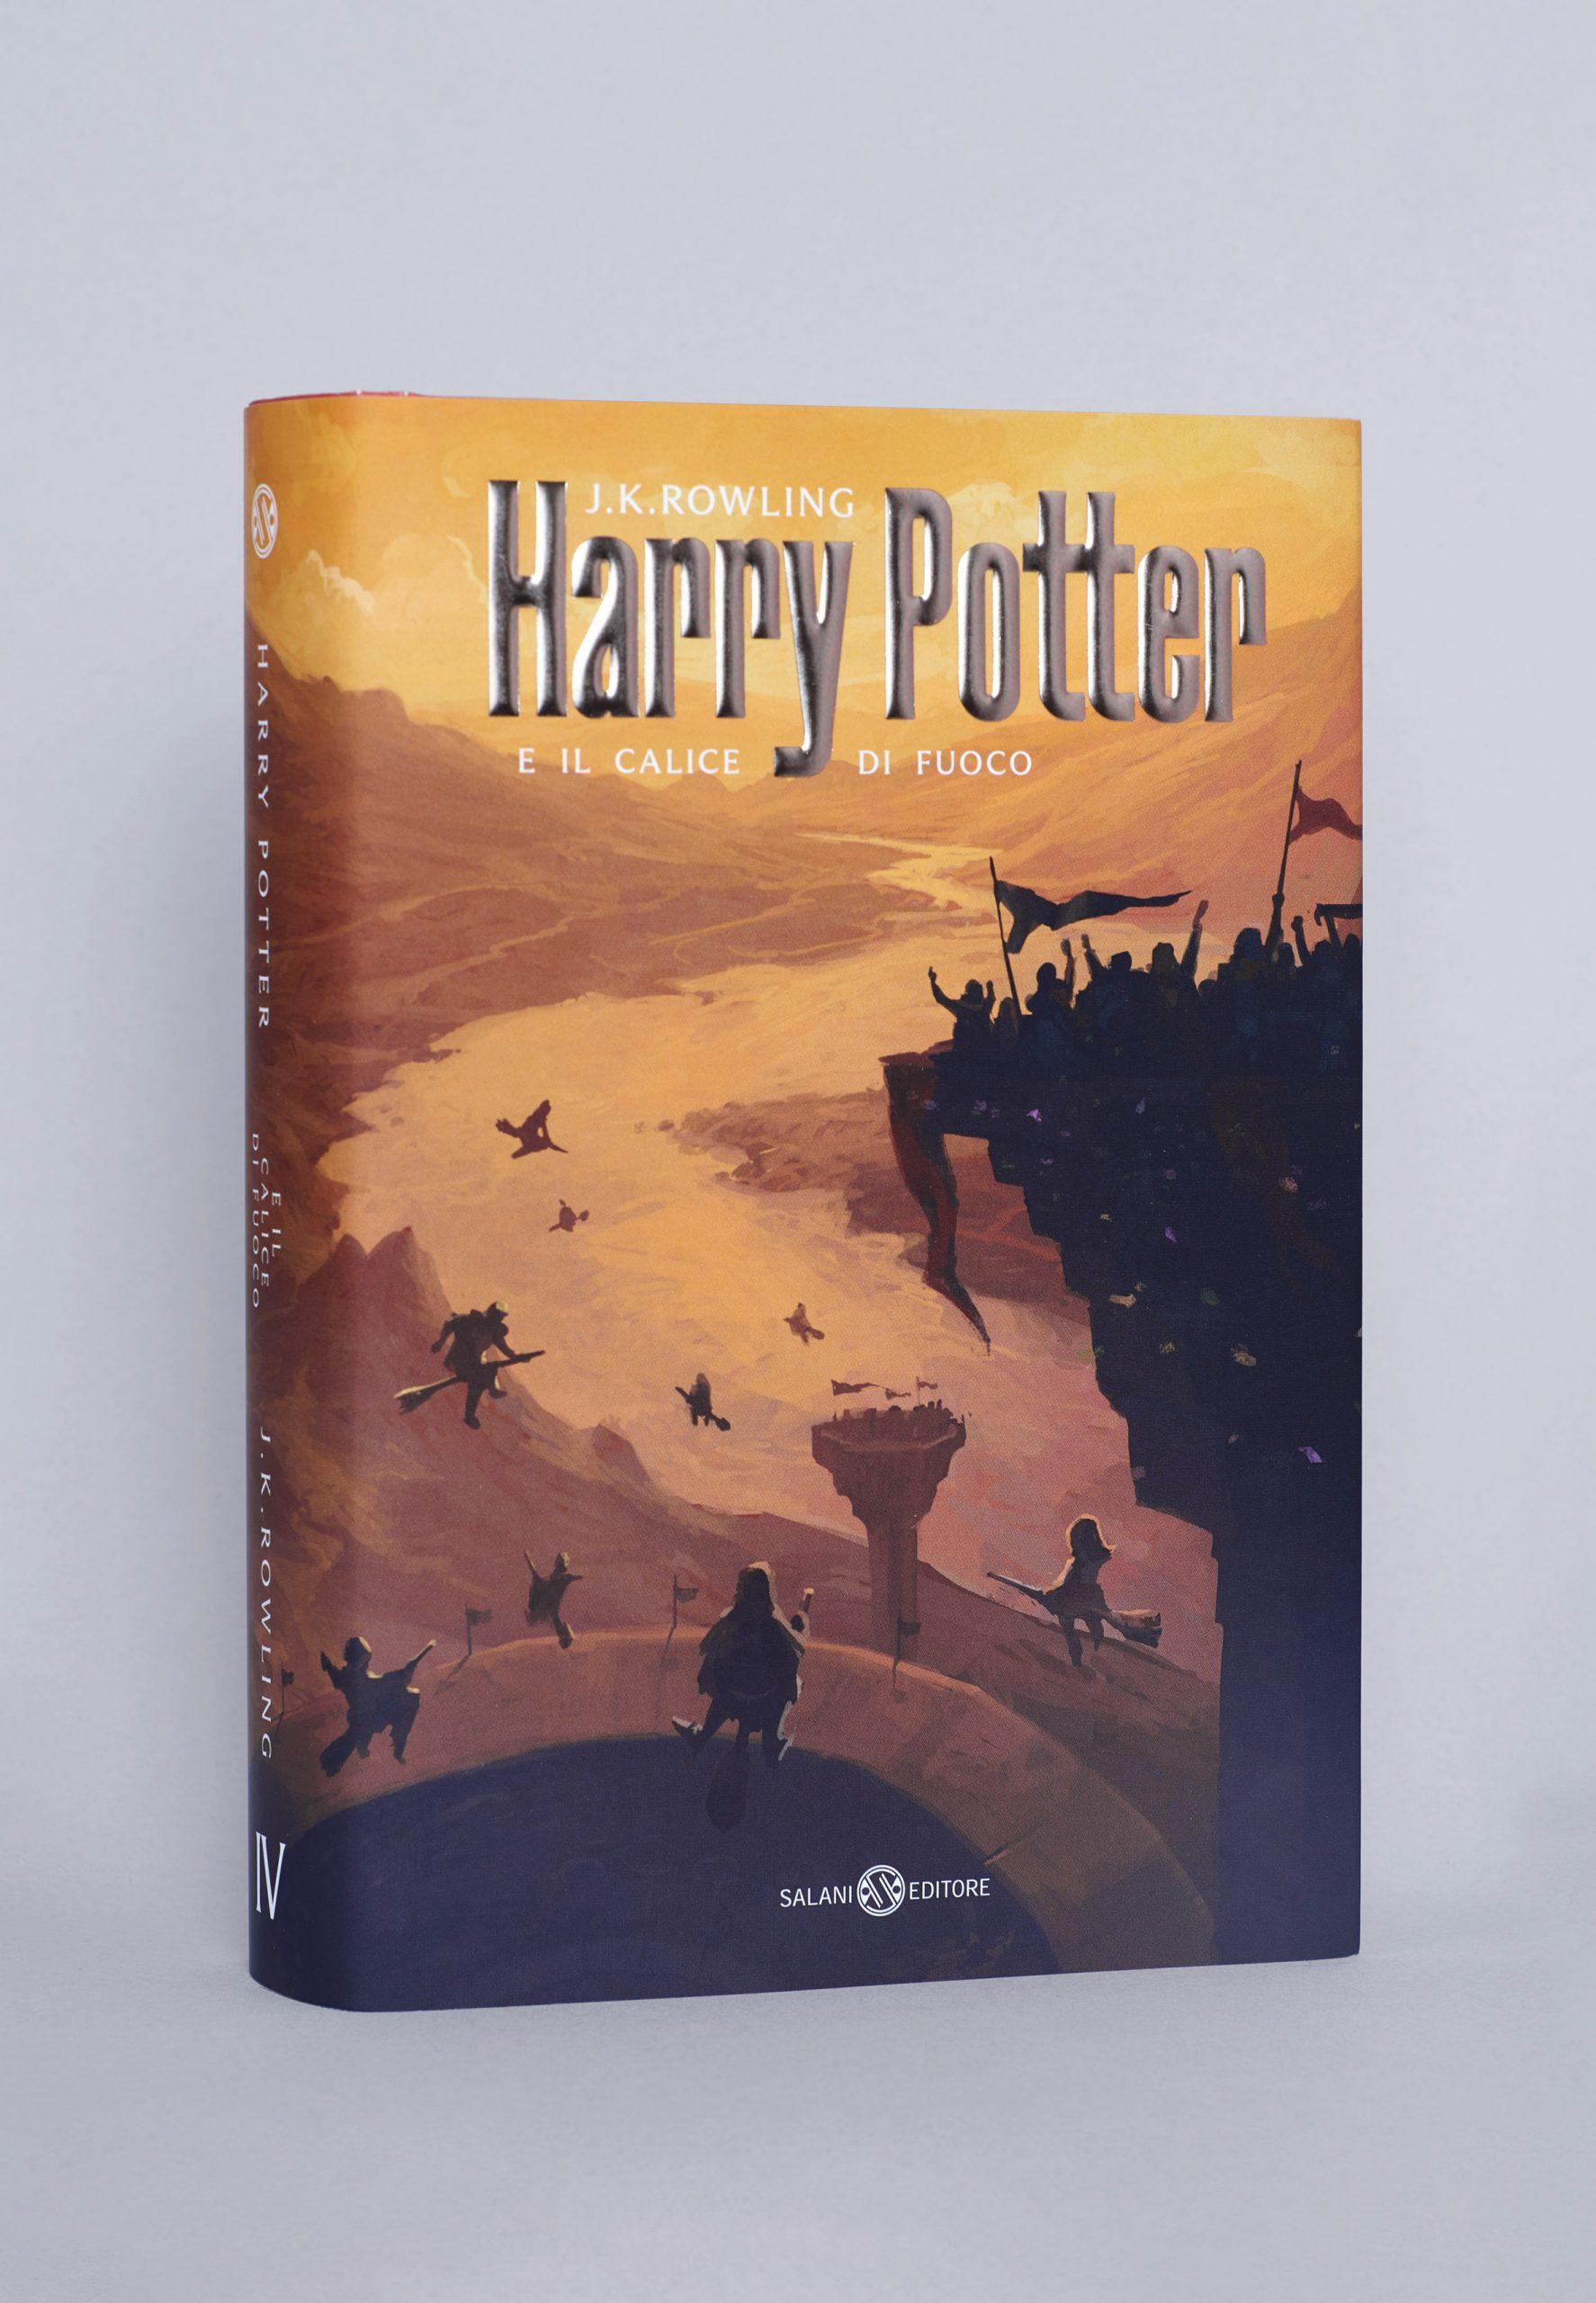 Italian edition cover (2021)